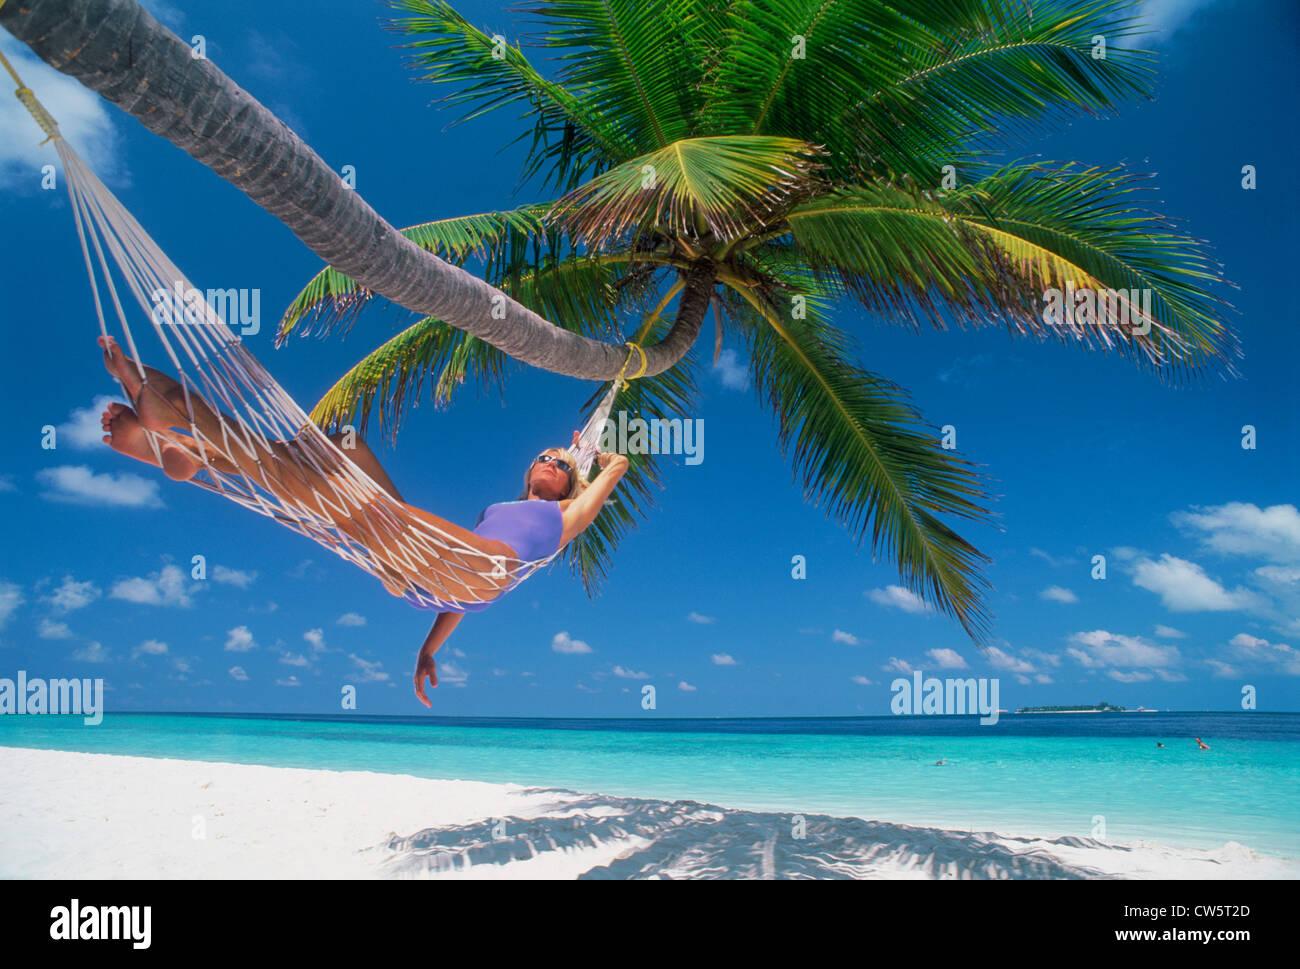 Woman in hammock under palm tree in idyllic holiday setting Stock Photo